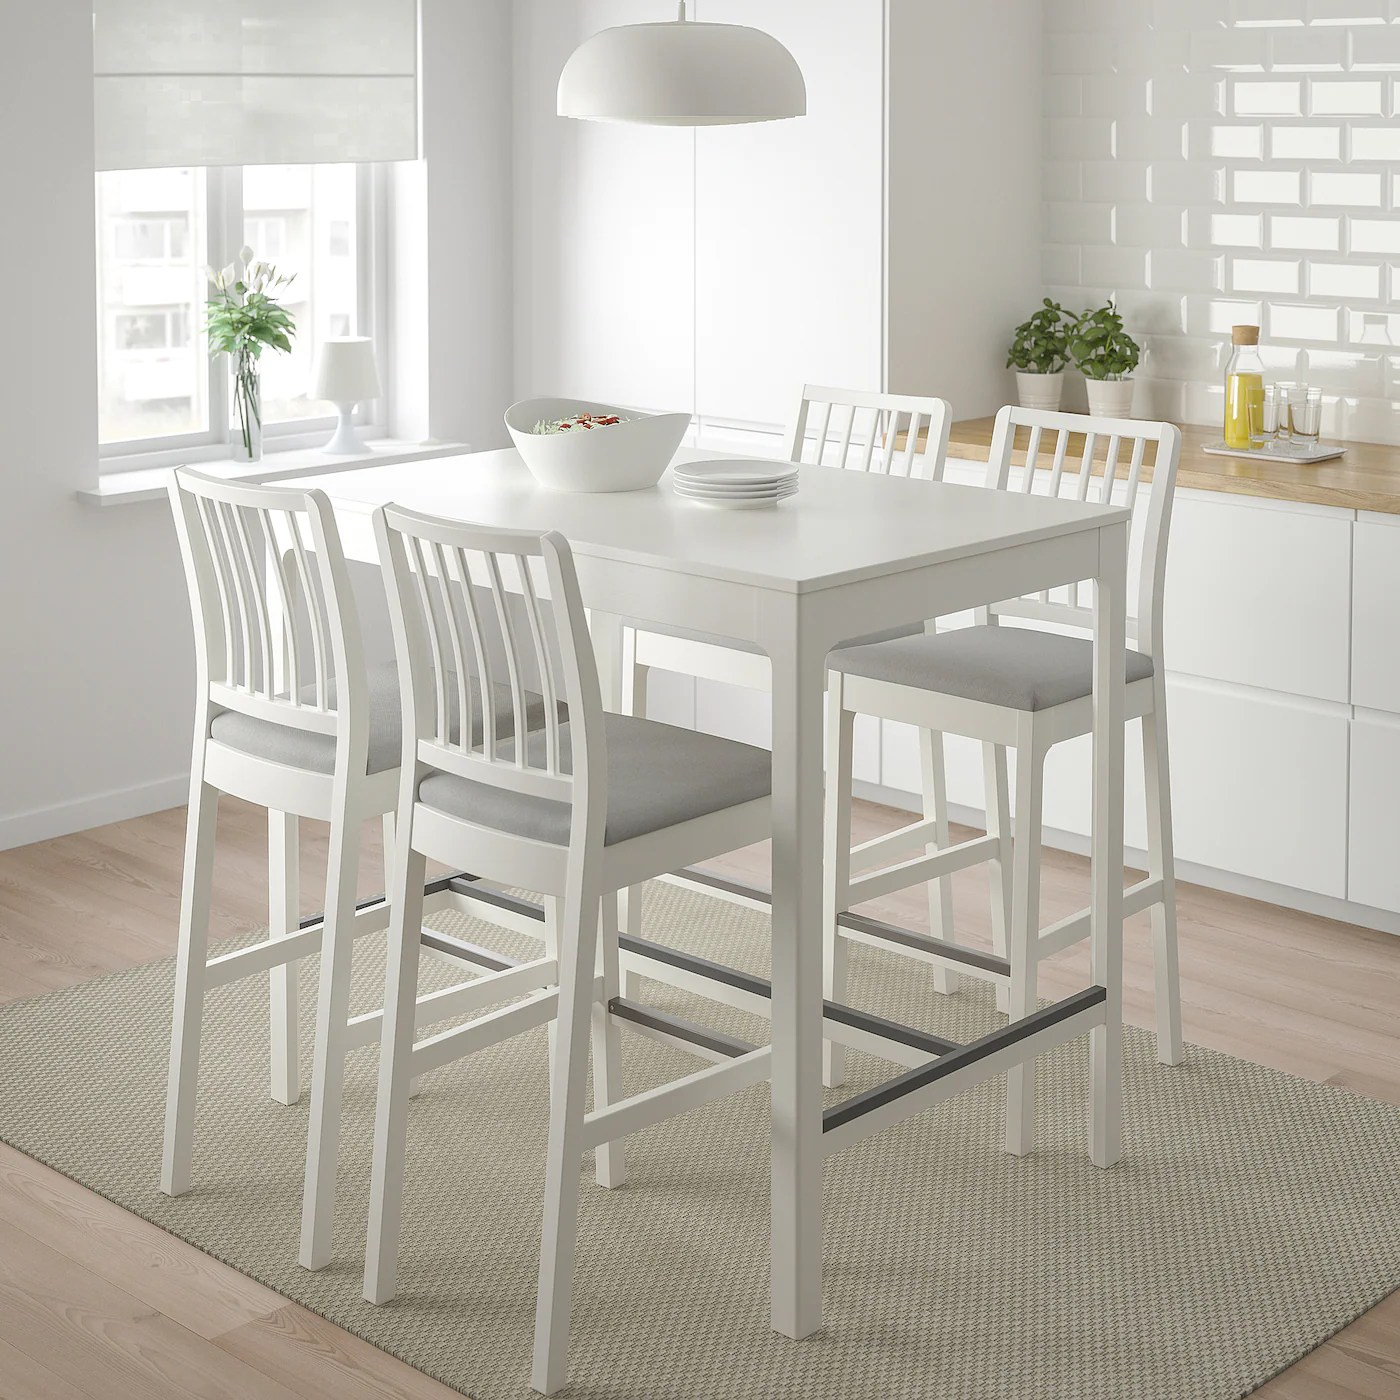 Ekedalen Tabouret Bar Dossier Blanc Orrsta Gris Clair 29 1 2 75 Cm Ikea